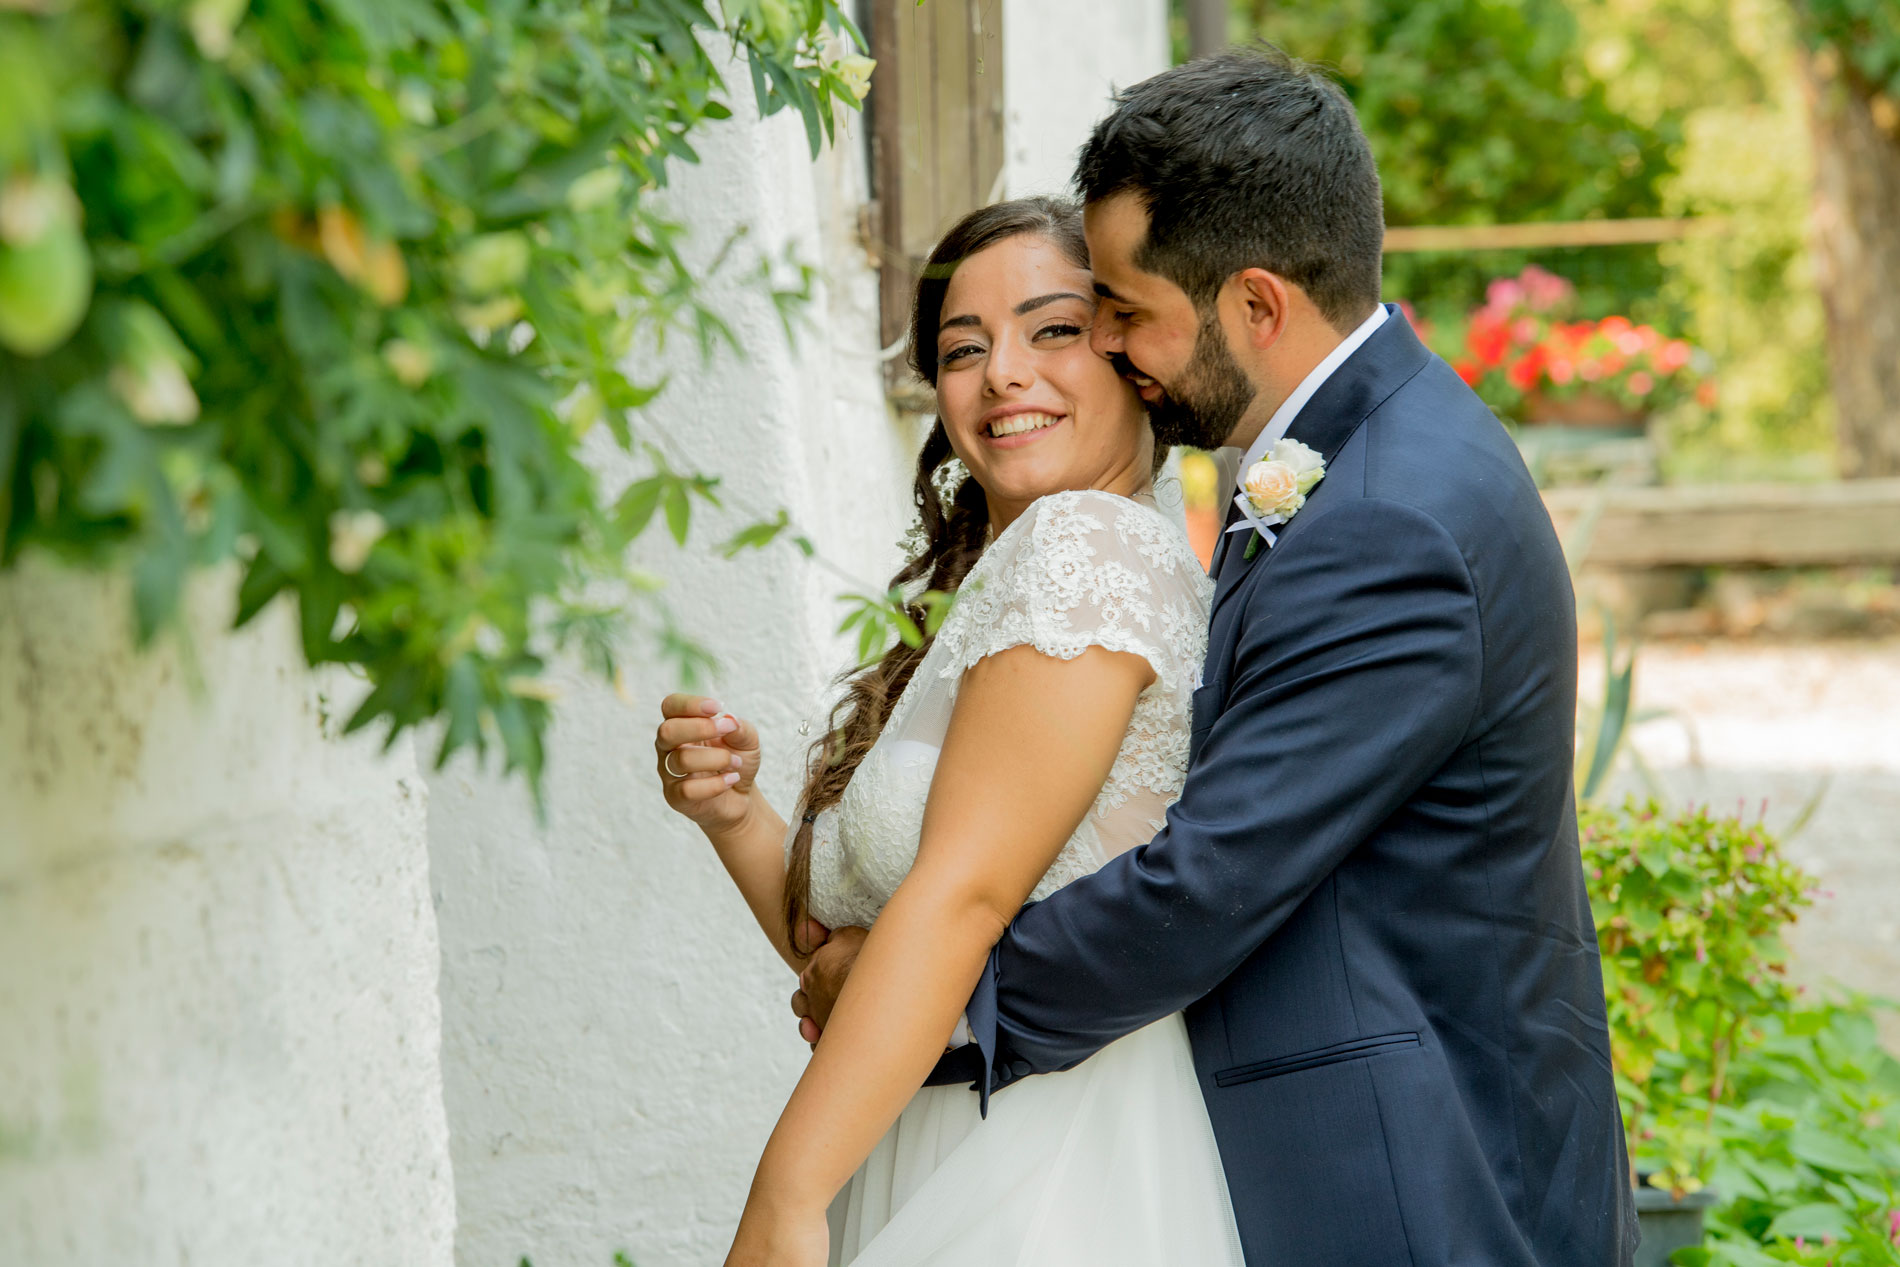 ivano-di-maria-wedding-photographer-giu-eman-12